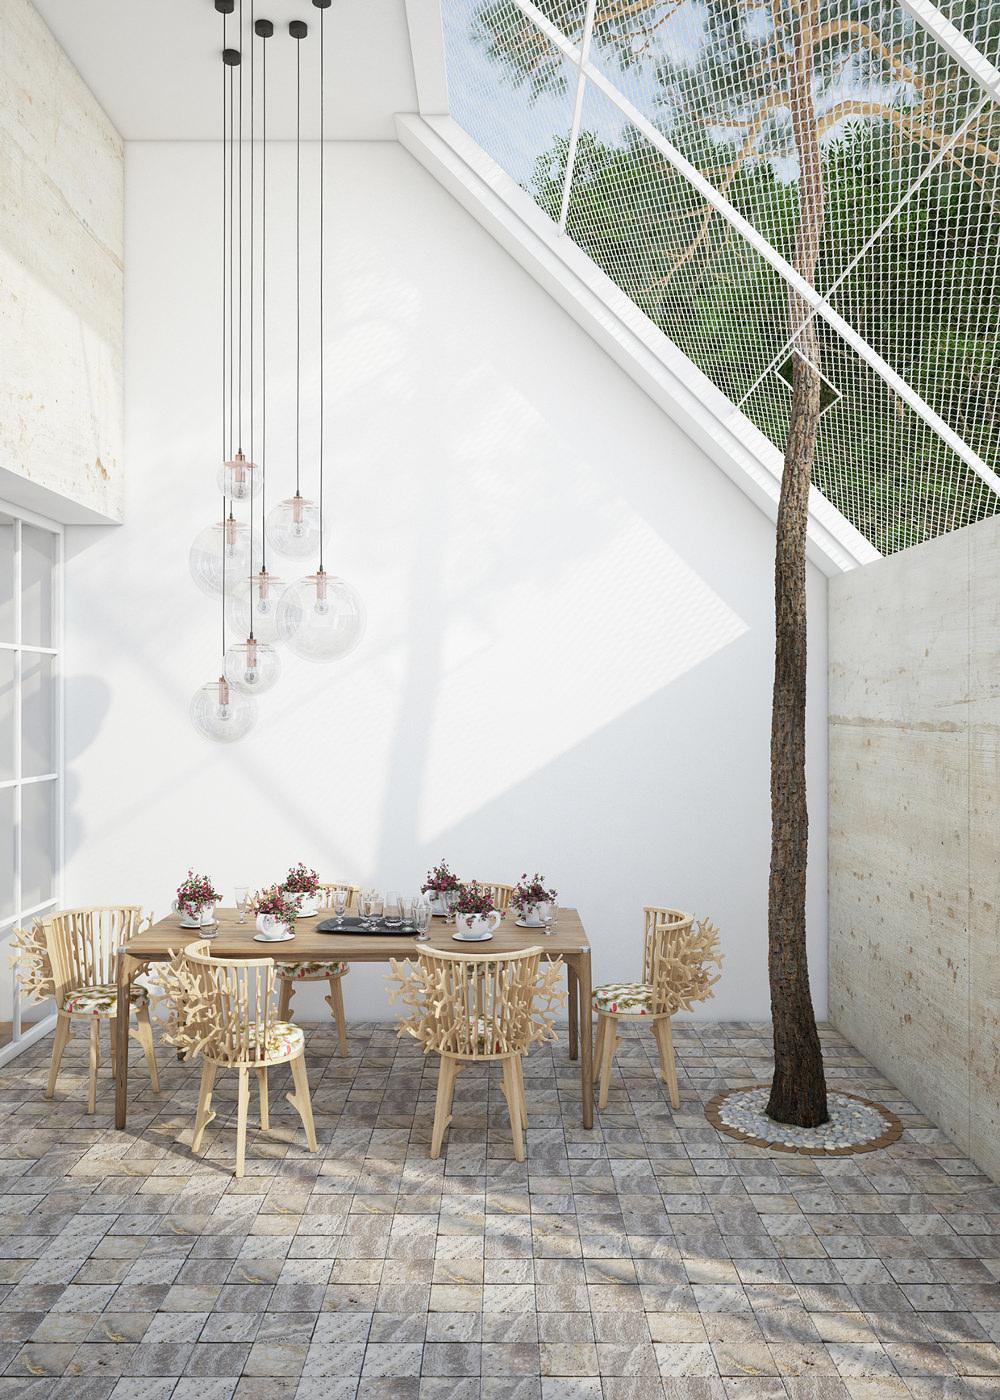 Branch chair la chaise nature par le studio Fajno